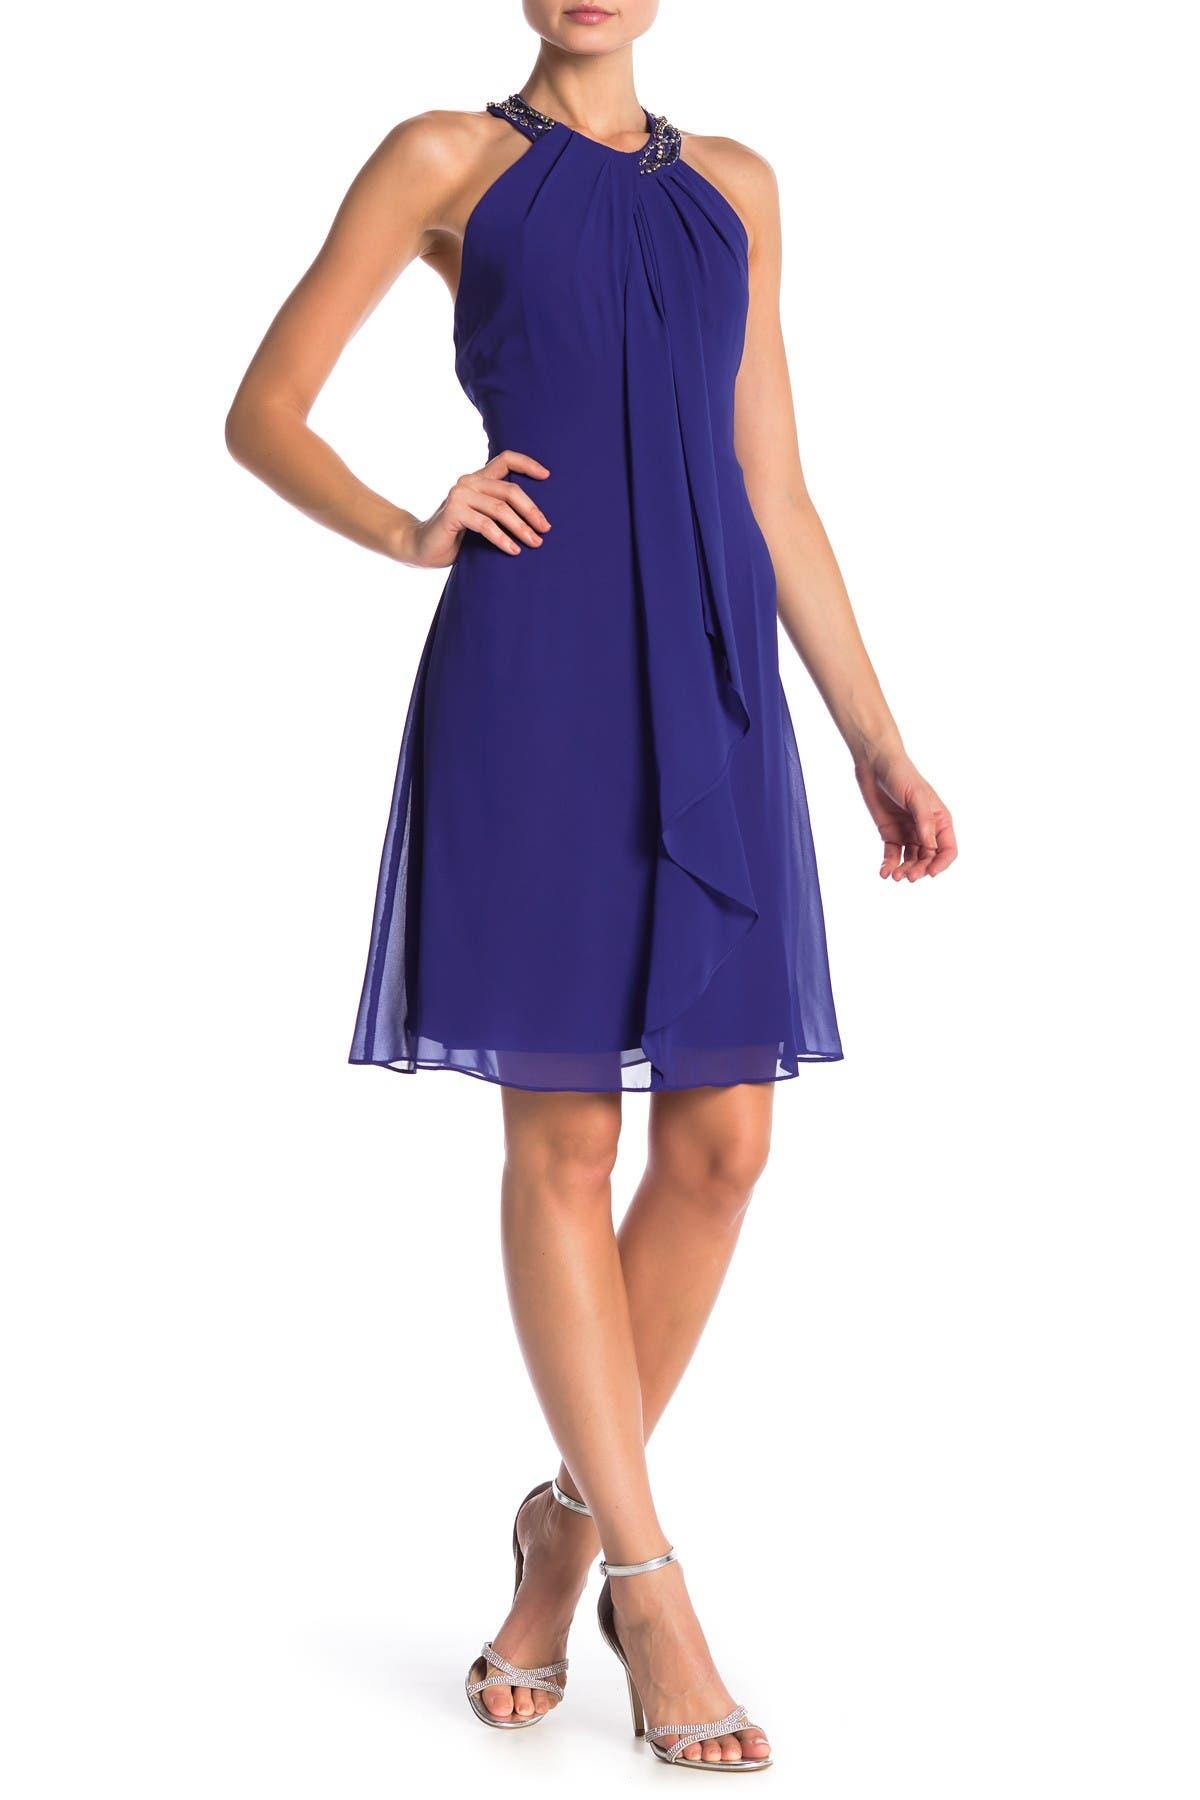 Image of SLNY Necklace Halter Dress